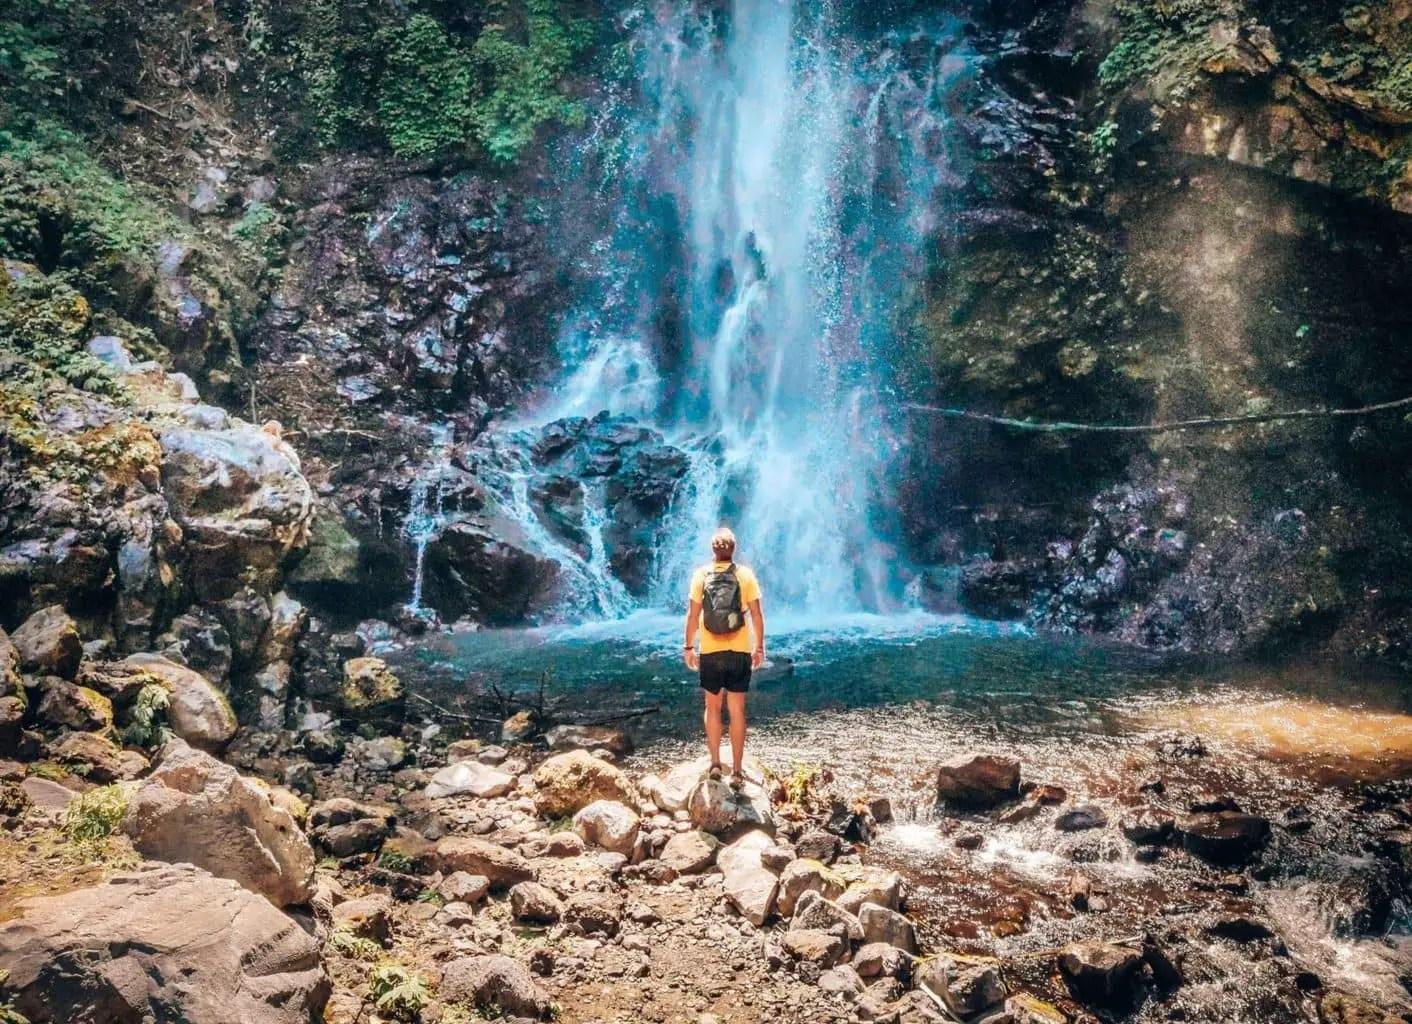 James at Melanting Waterfall in Munduk Bali Indonesia